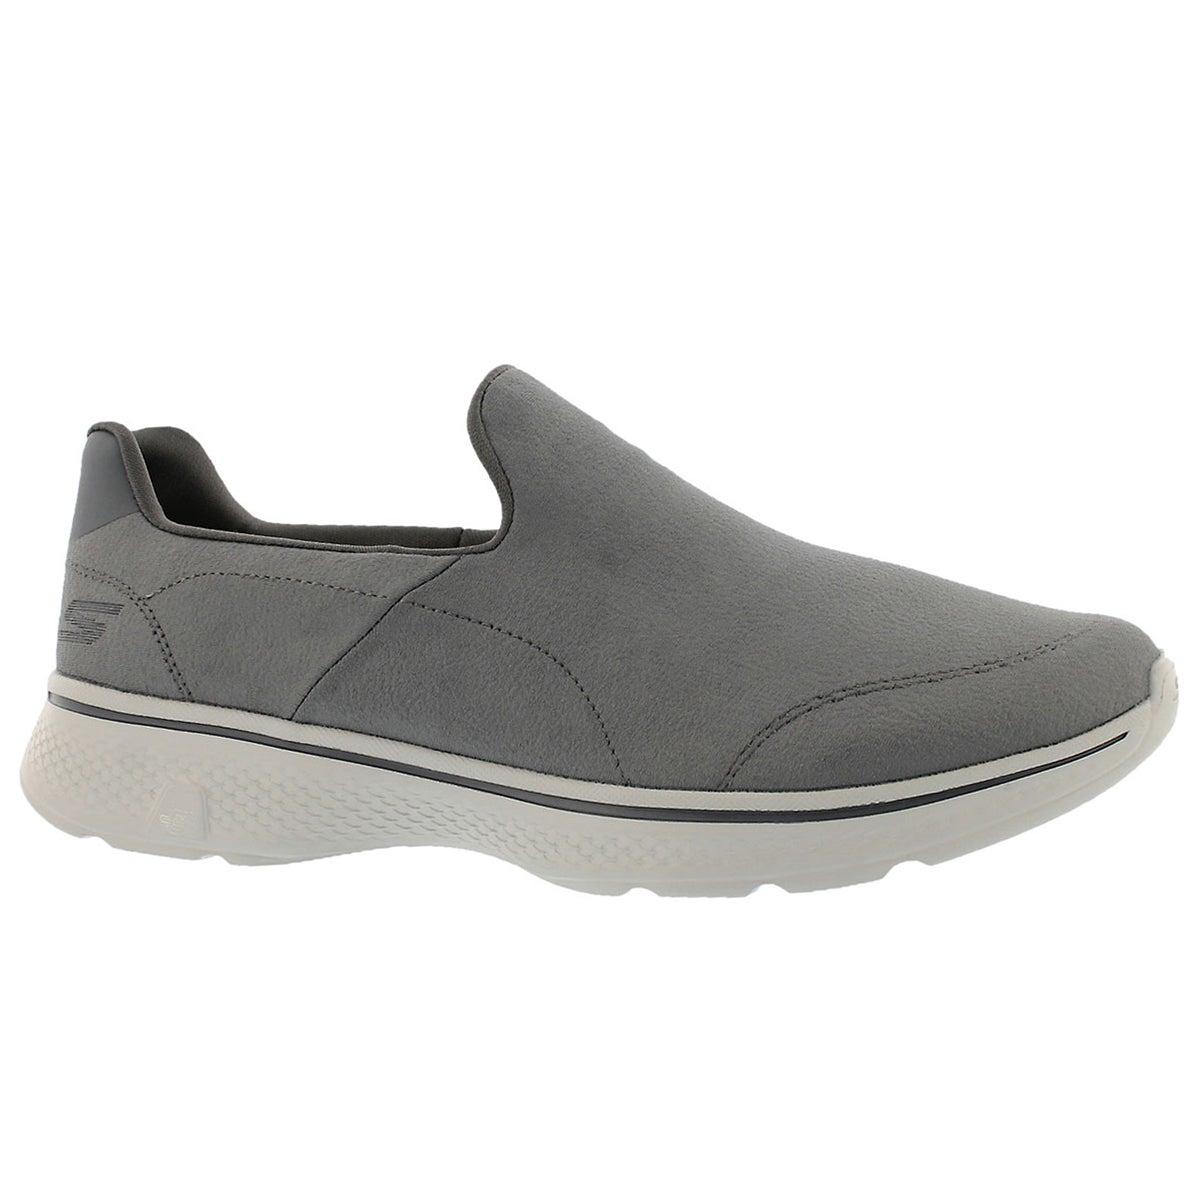 Men's GOwalk 4 REMARKABLE charcoal slip on shoes